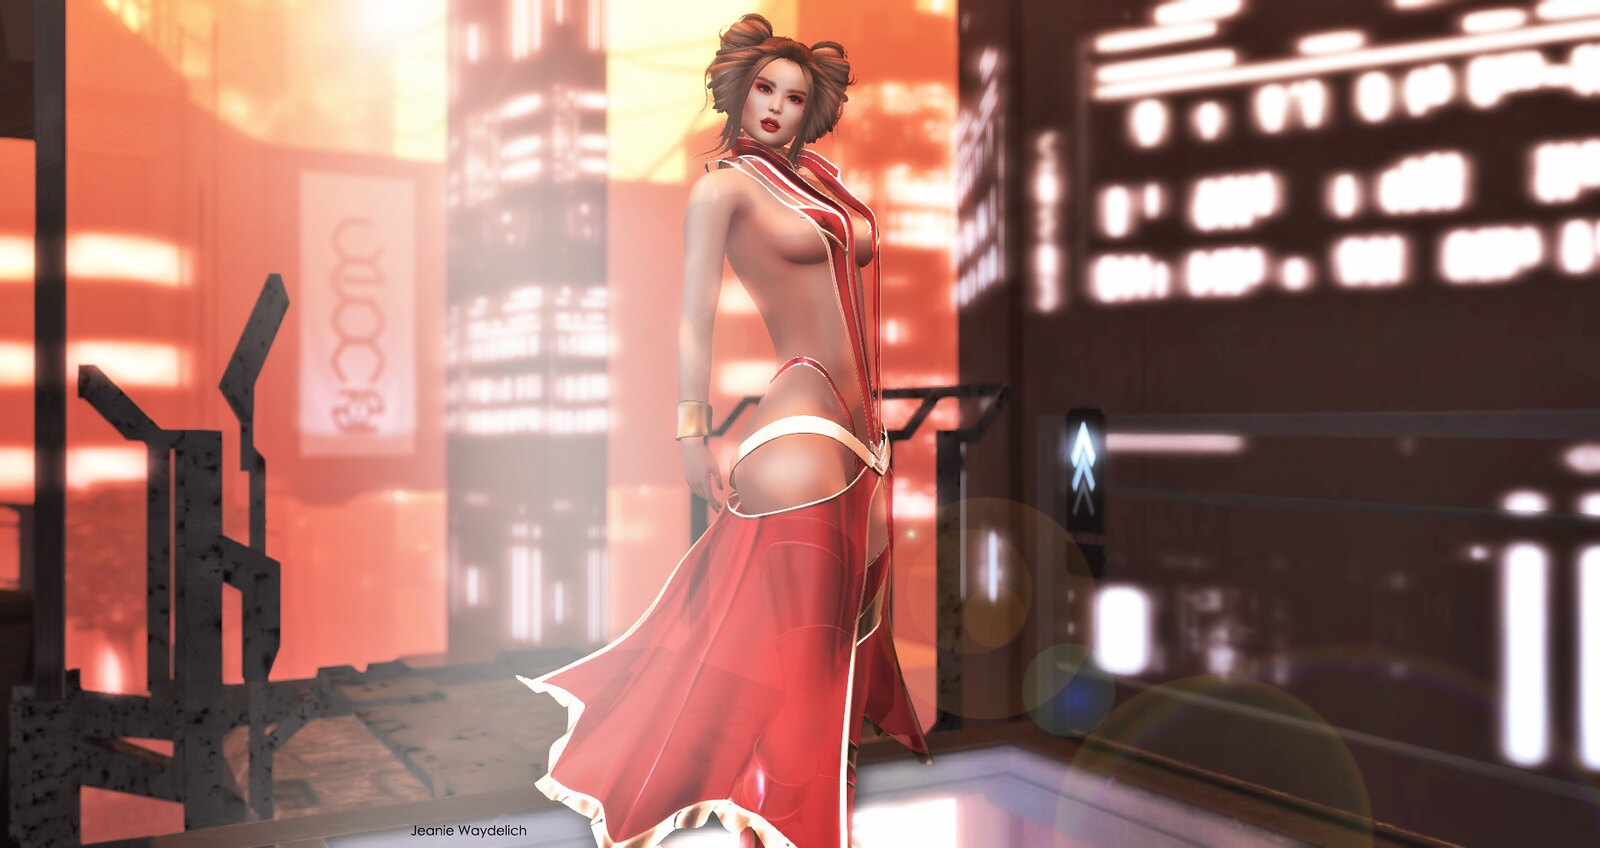 LOTD 888 - Red & Hot